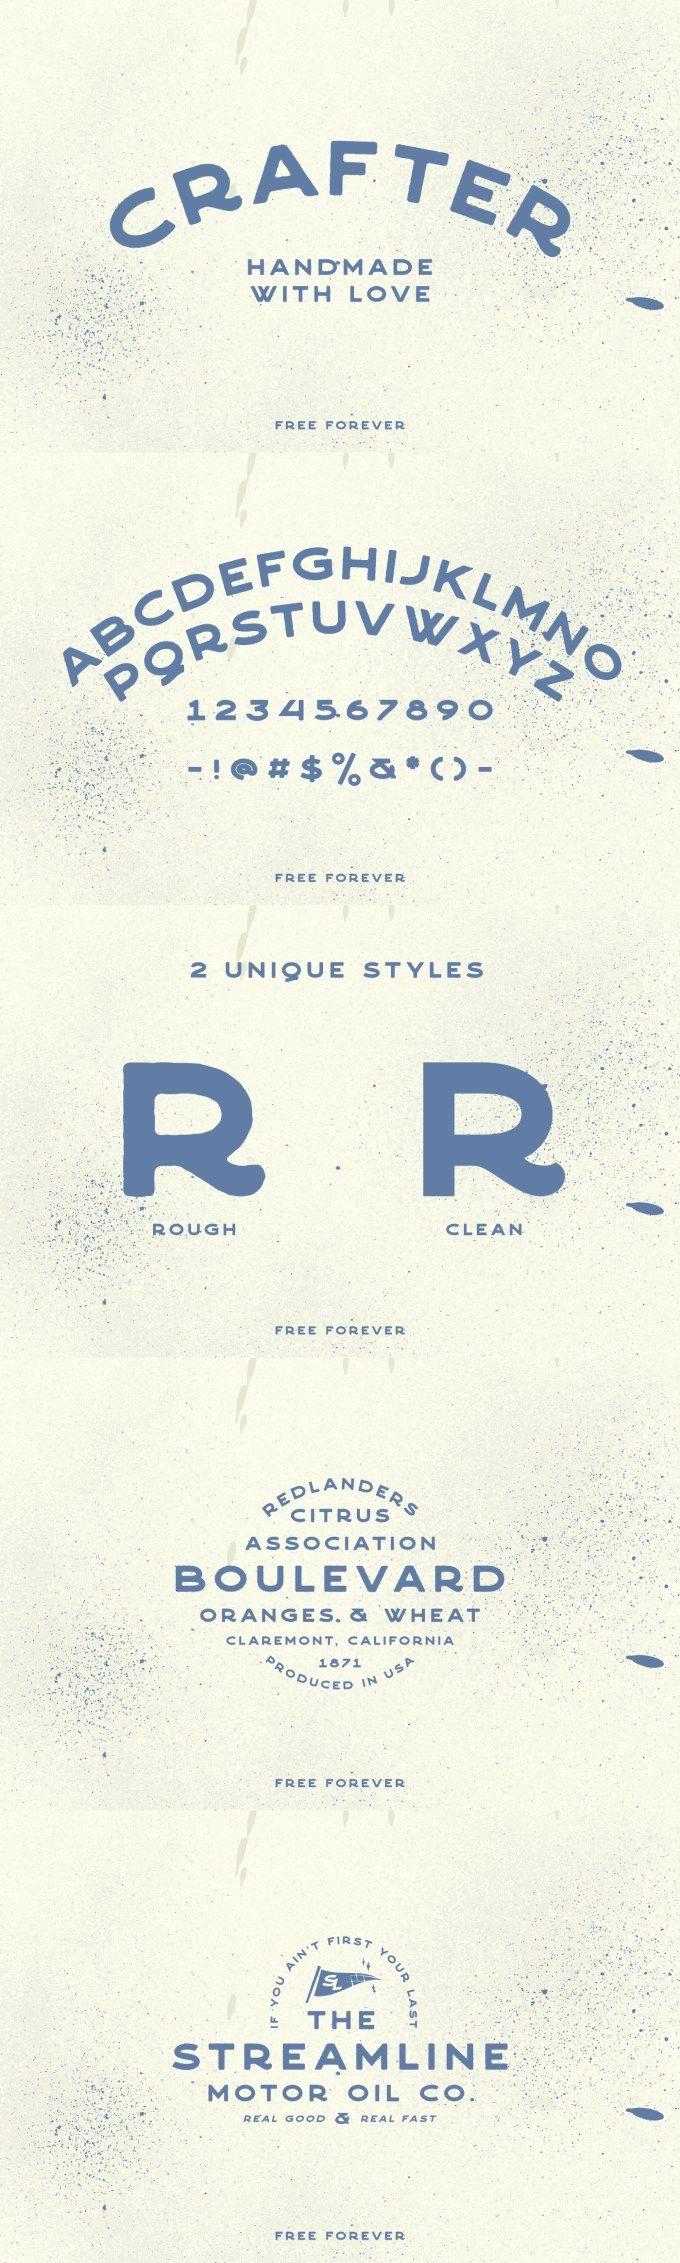 Crafter – Free Vintage Font – Pixel Surplus